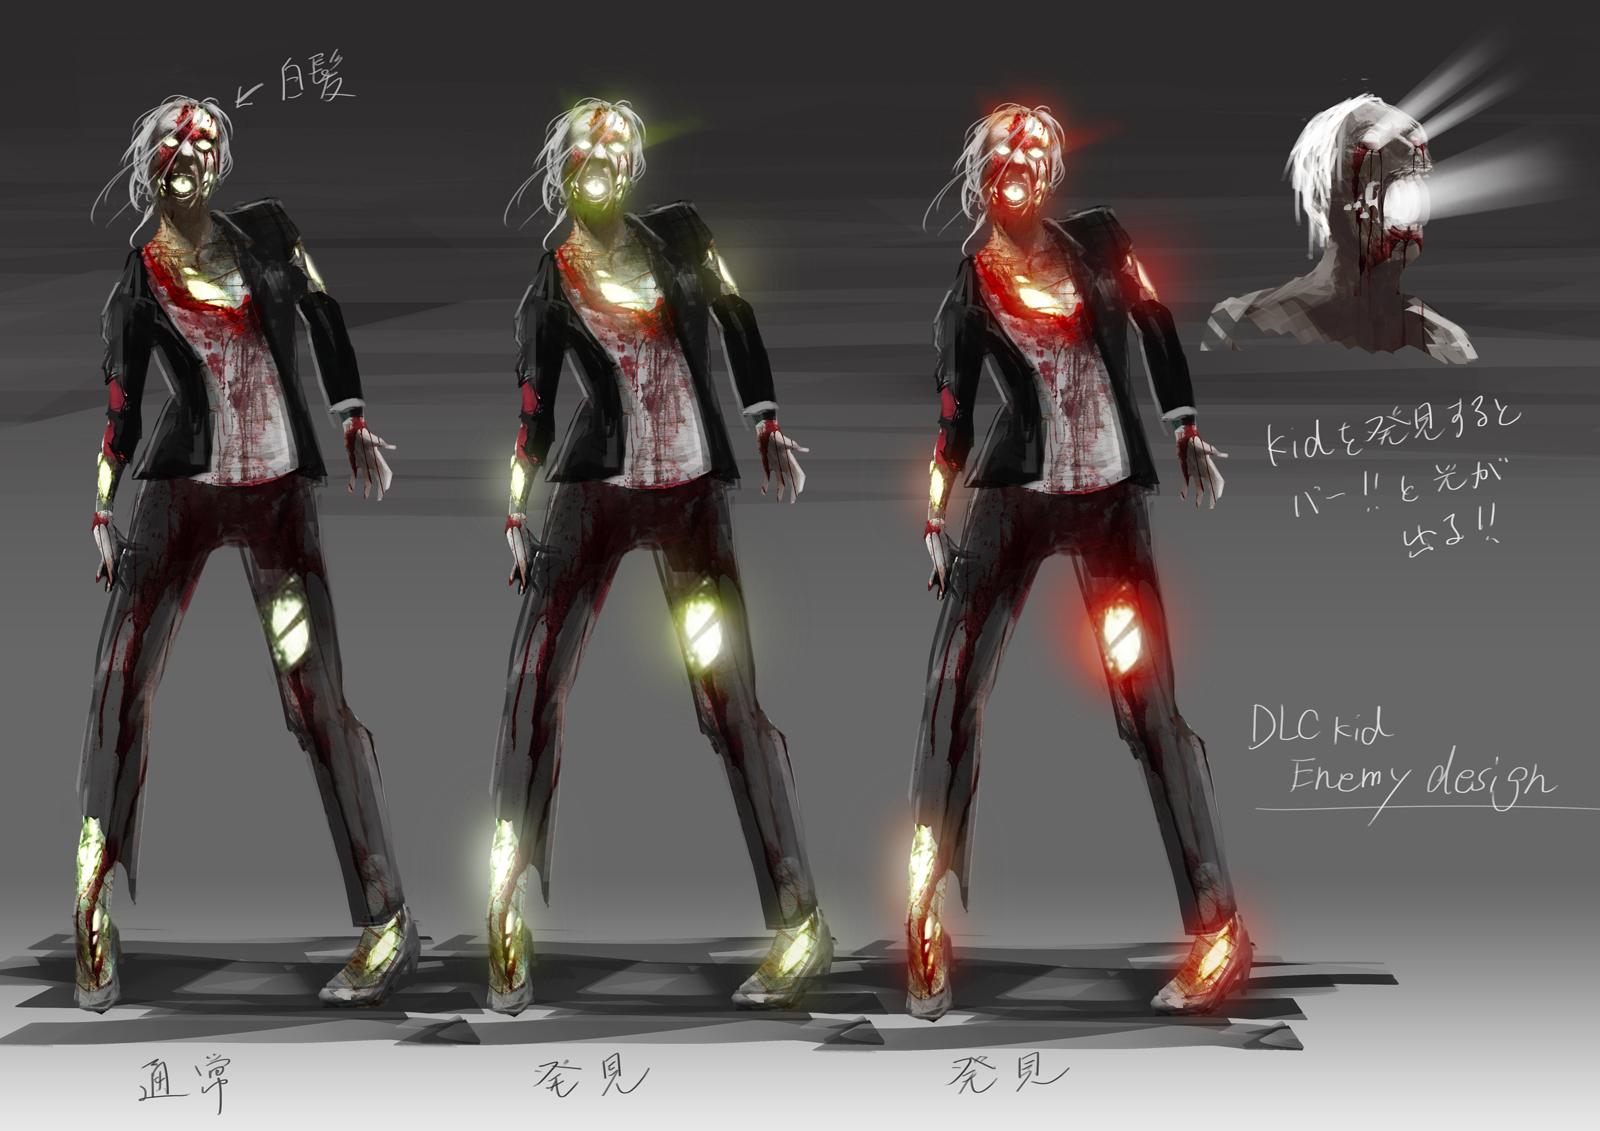 Artworky nových nepřátel v DLC do The Evil Within 106174